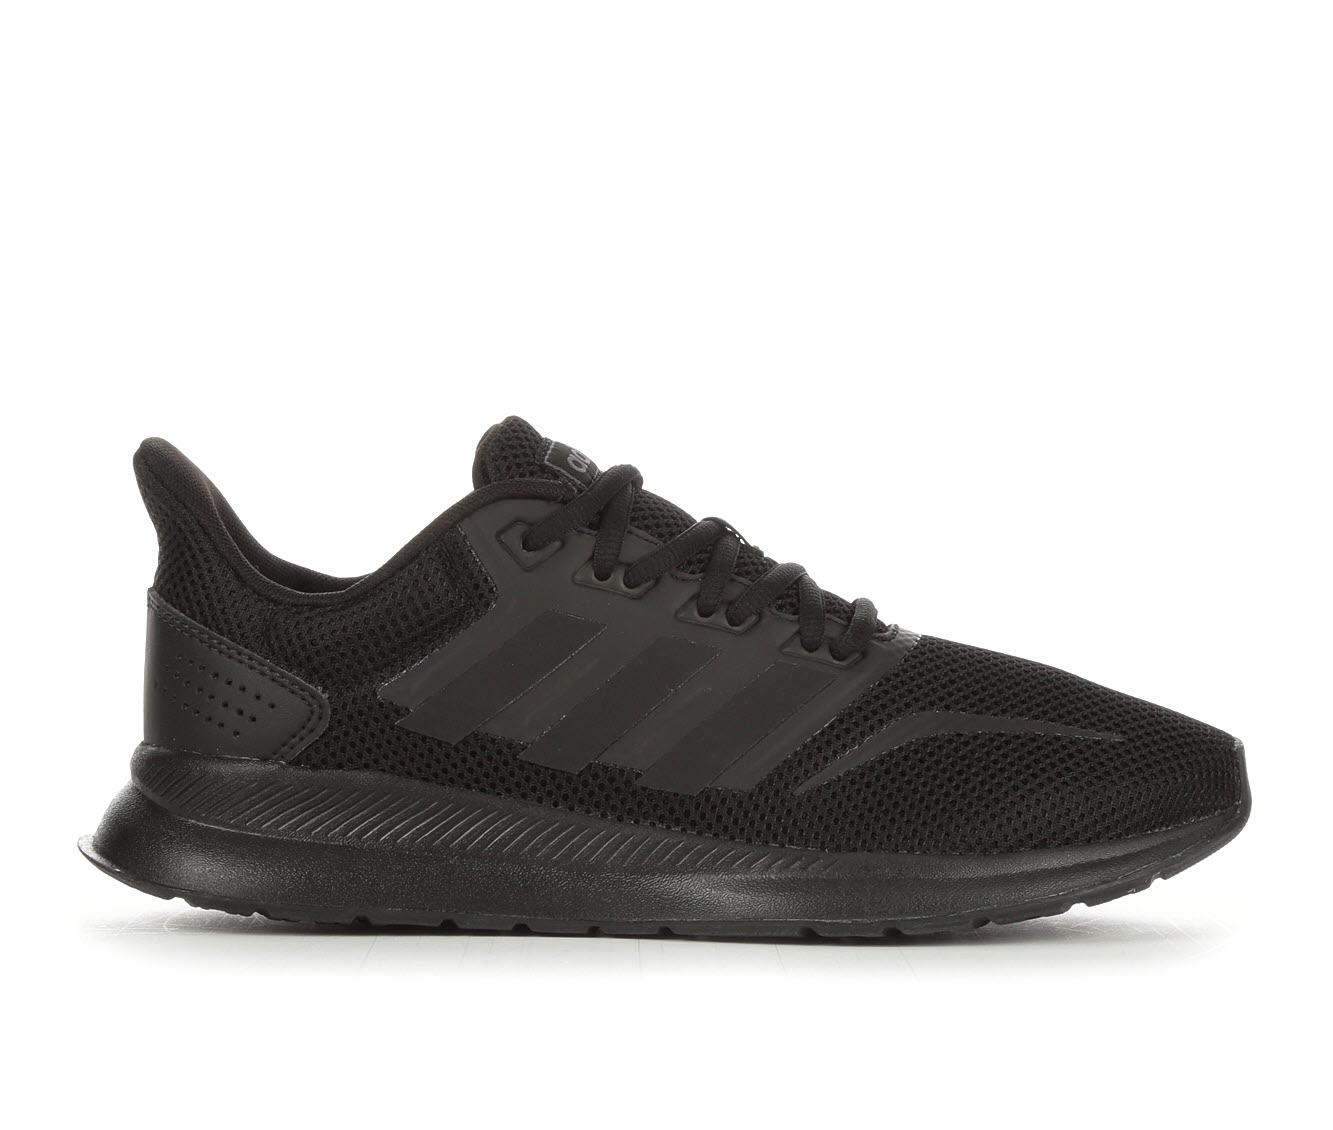 Adidas RunFalcon Women's Athletic Shoe (Black)